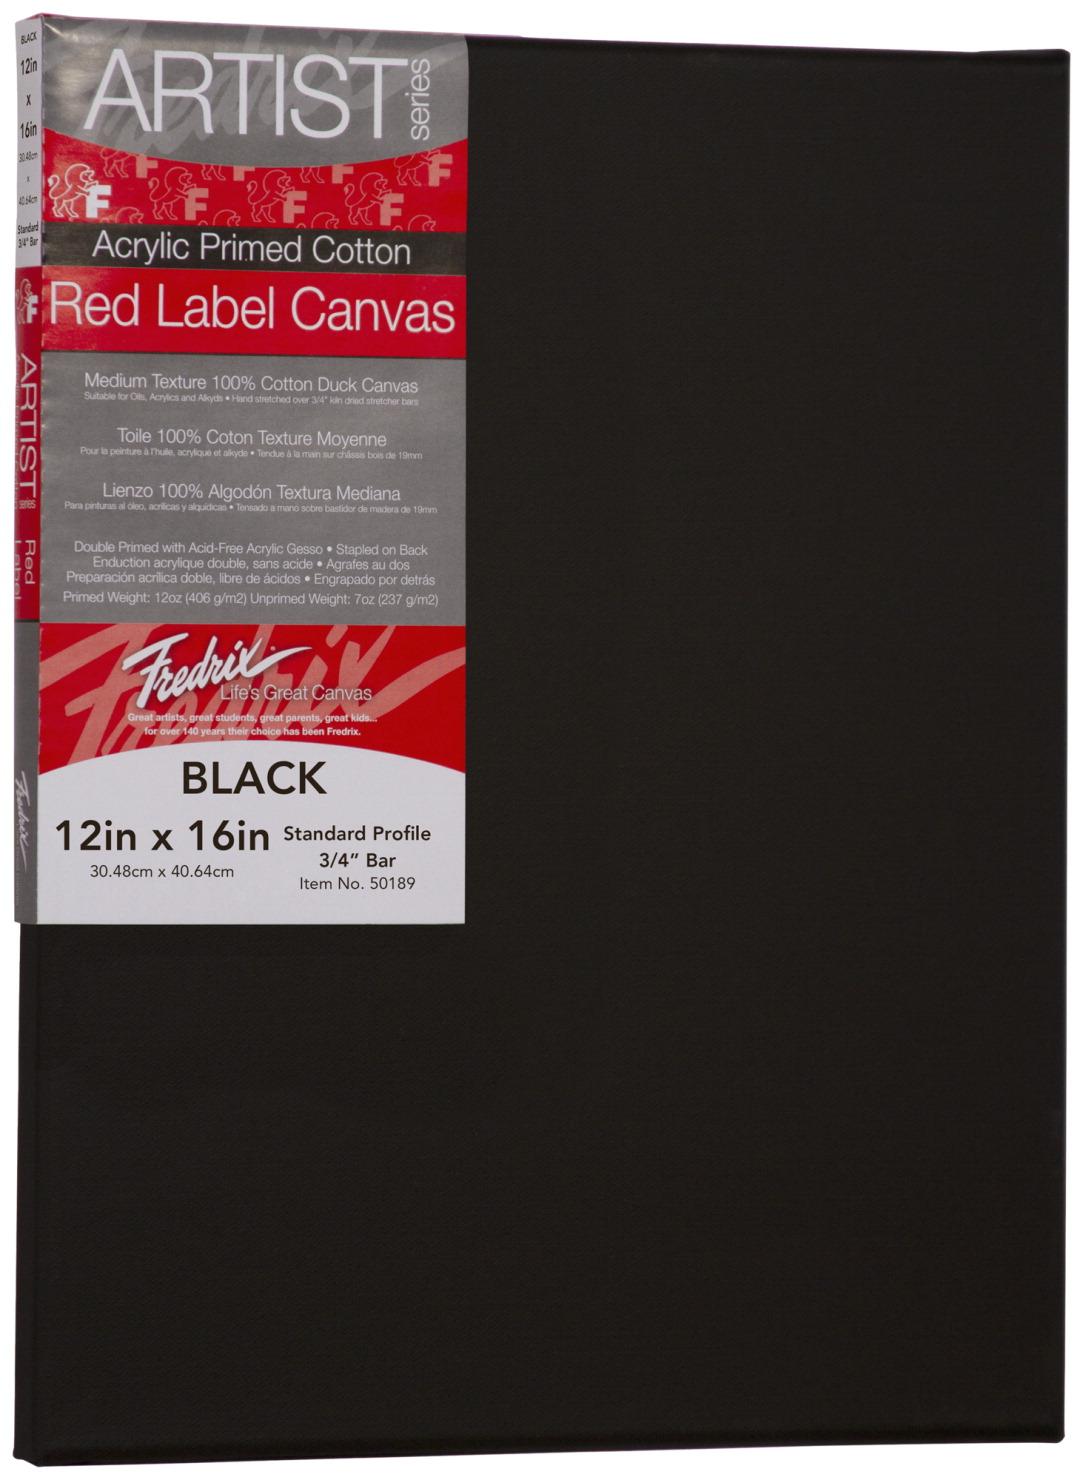 Fredrix Red Label Canvas 12 x 16 in, Black